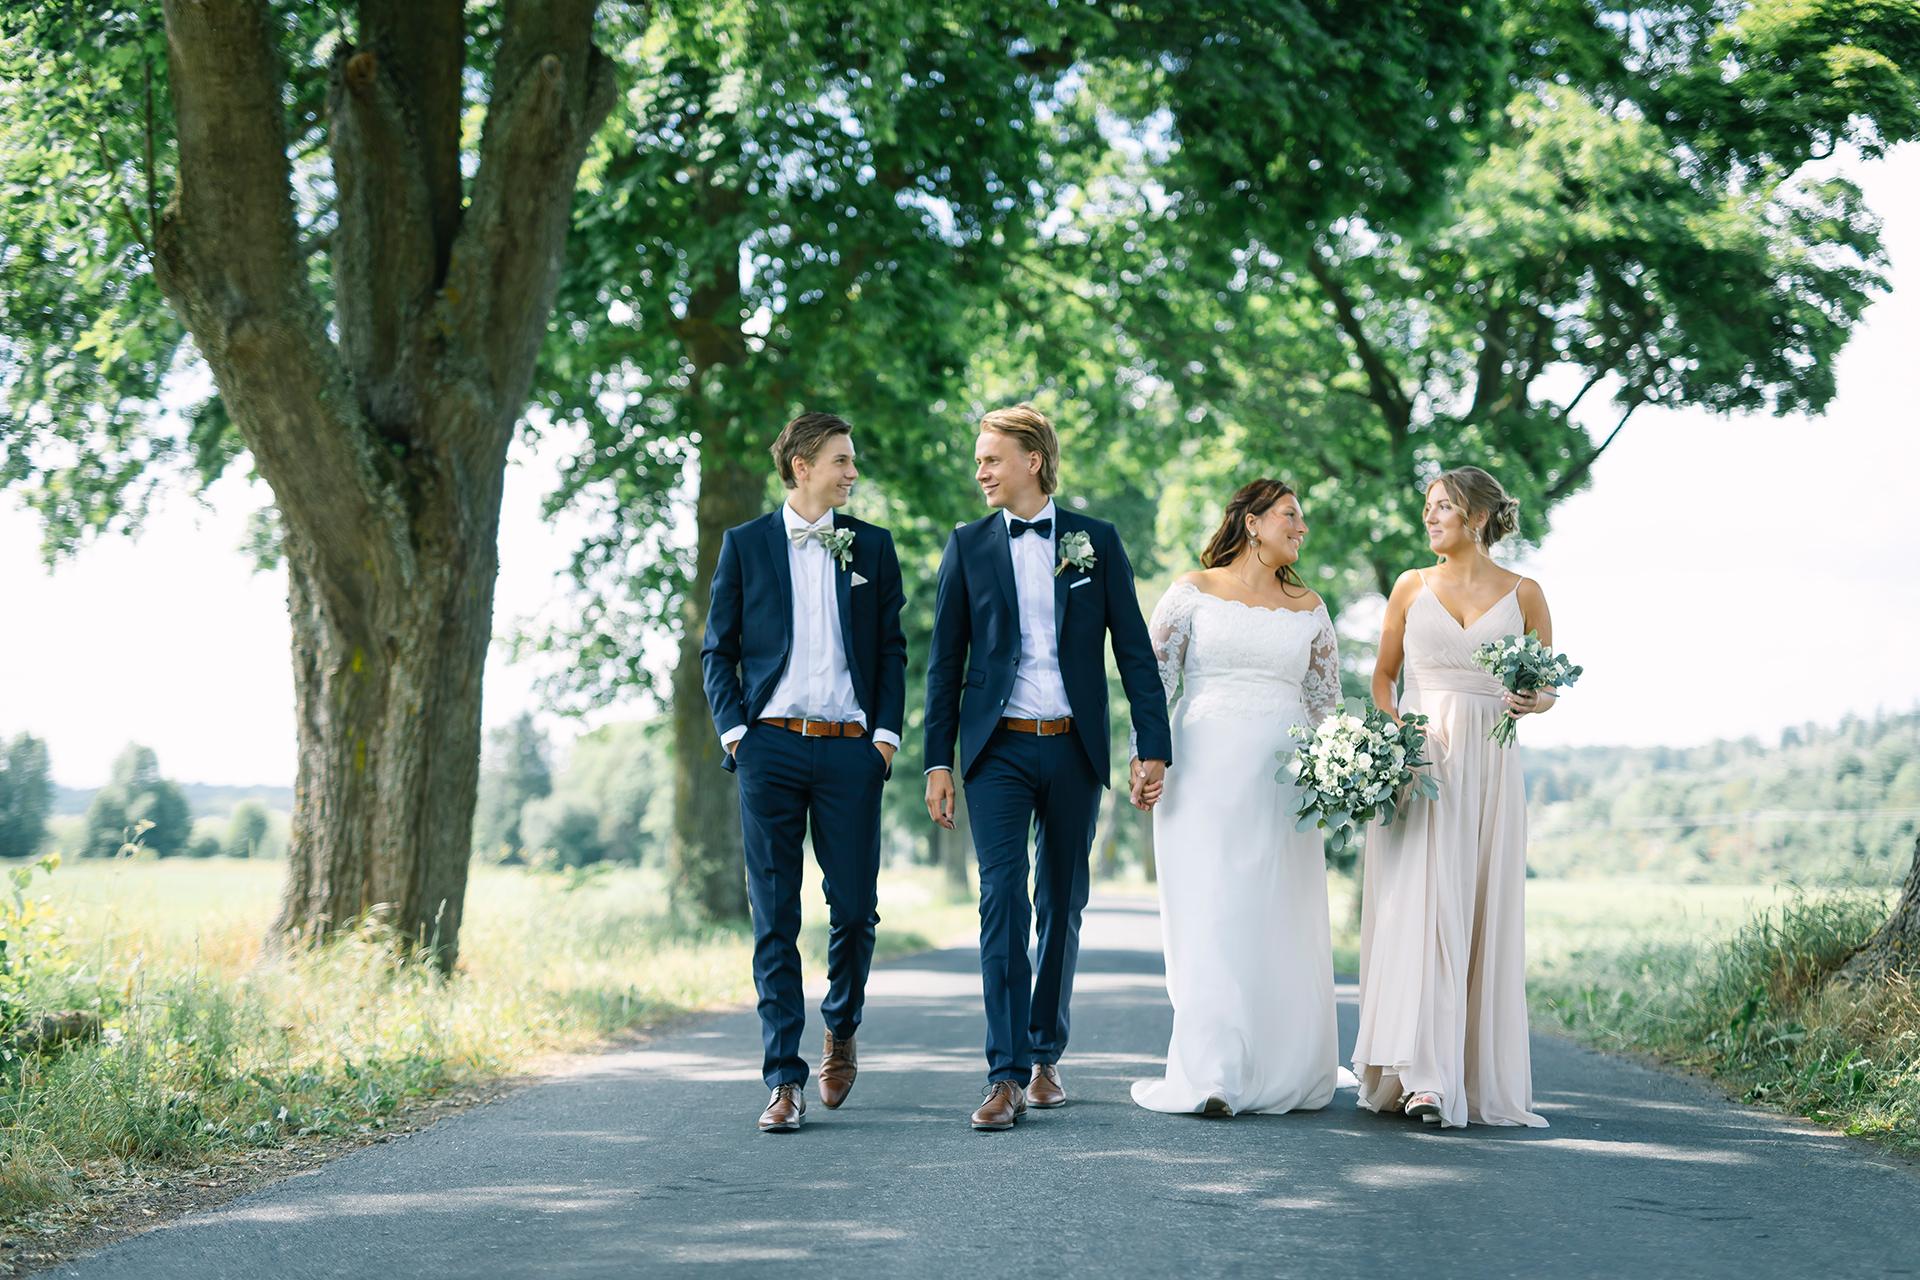 Bröllop_2G5A0795EllenSimon.jpg